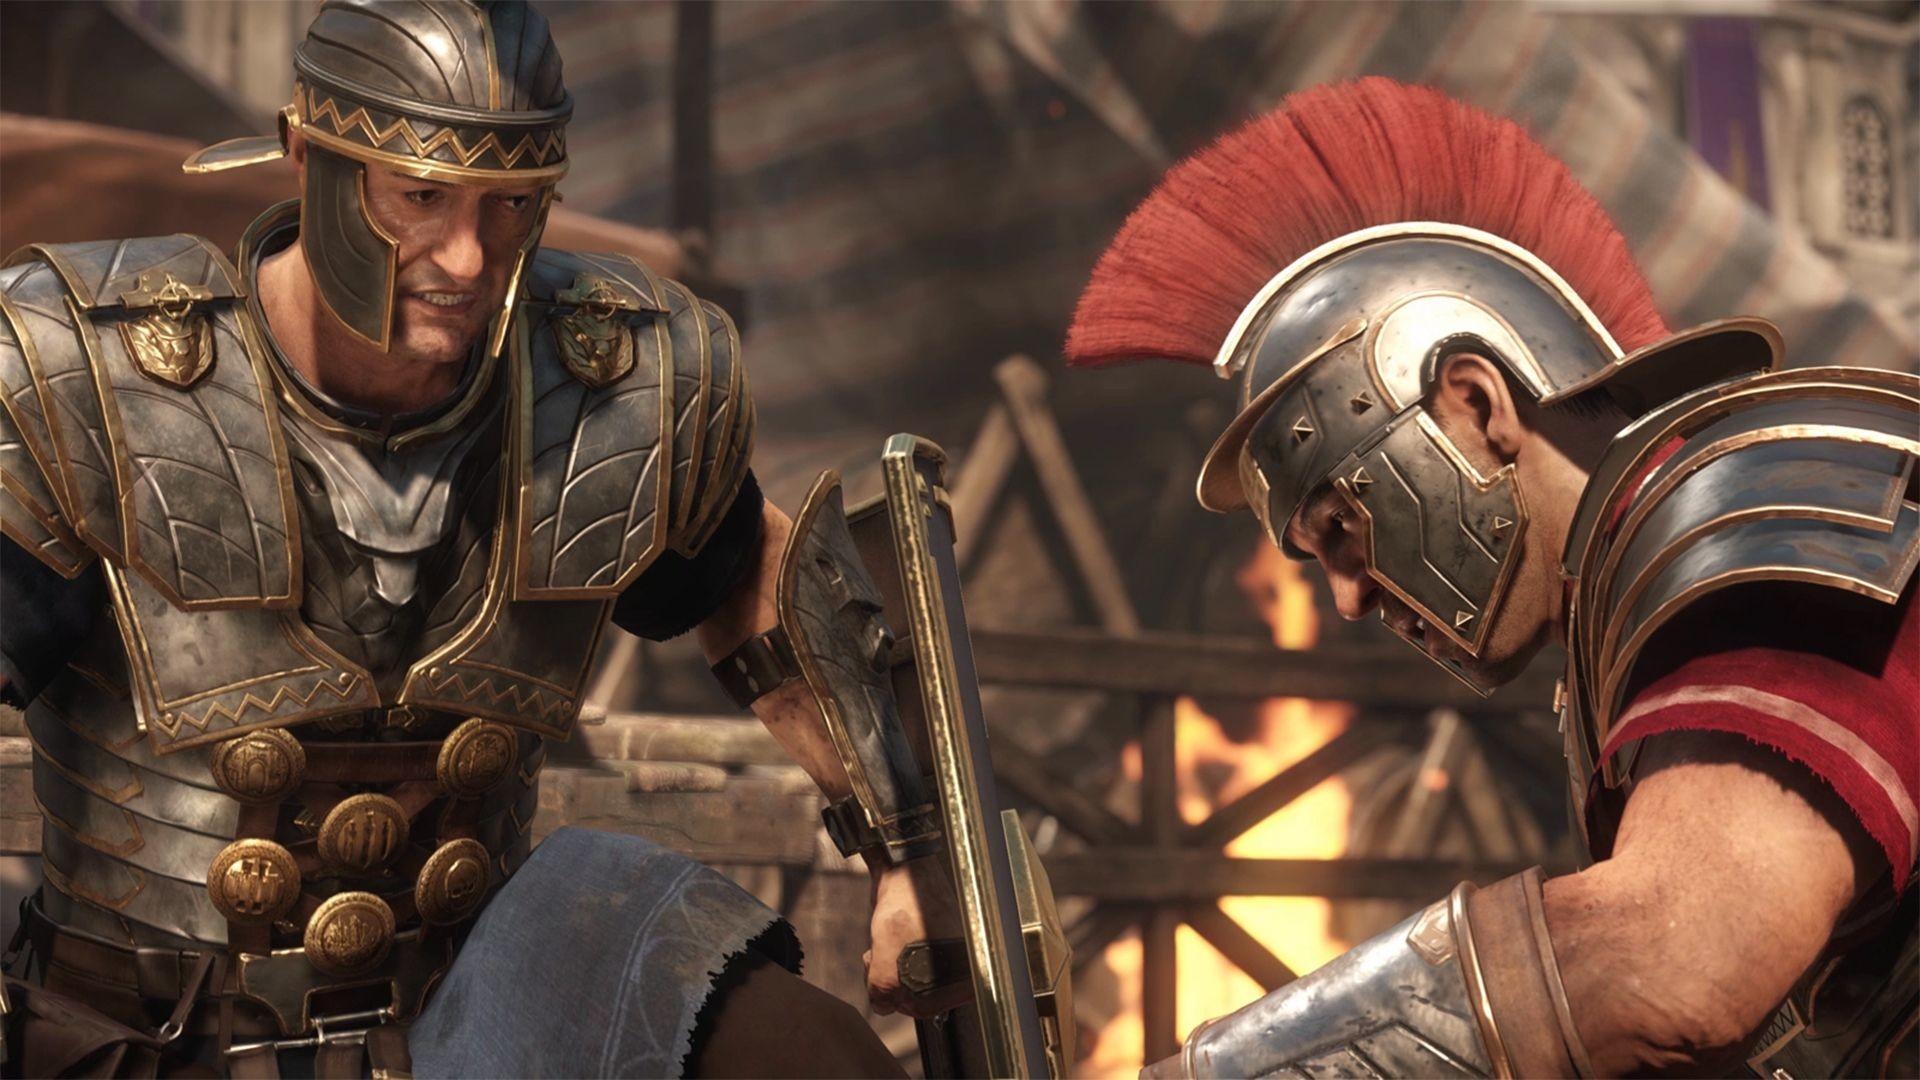 Roman Soldier Wallpaper Roman game warrior armor t